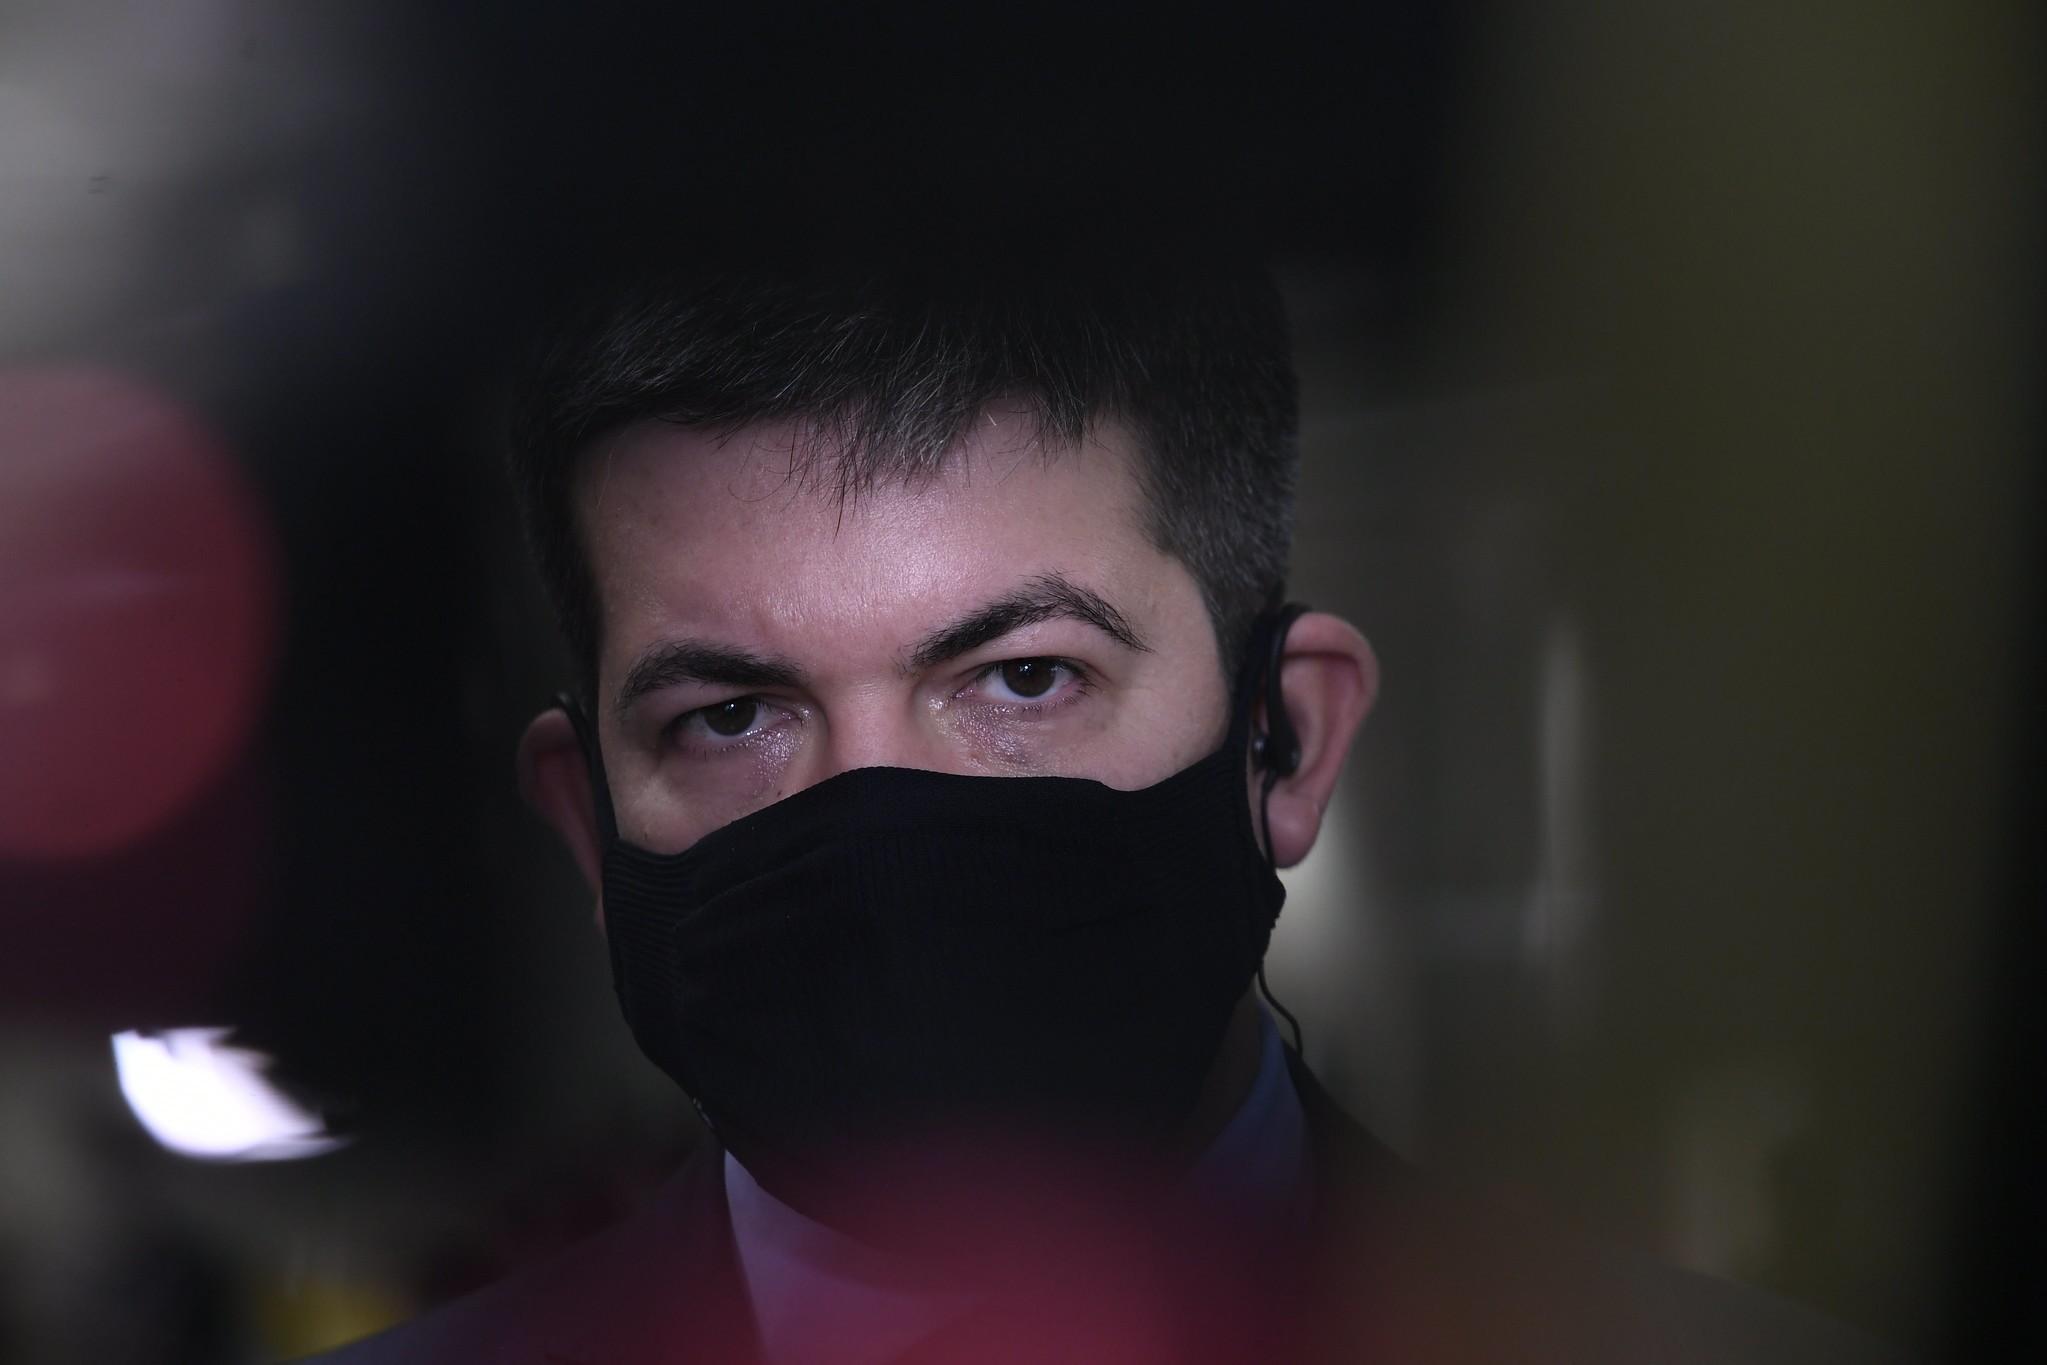 """[Tráfico de influência] é o menor dos crimes"" de Pazuello, diz Randolfe Rodrigues"